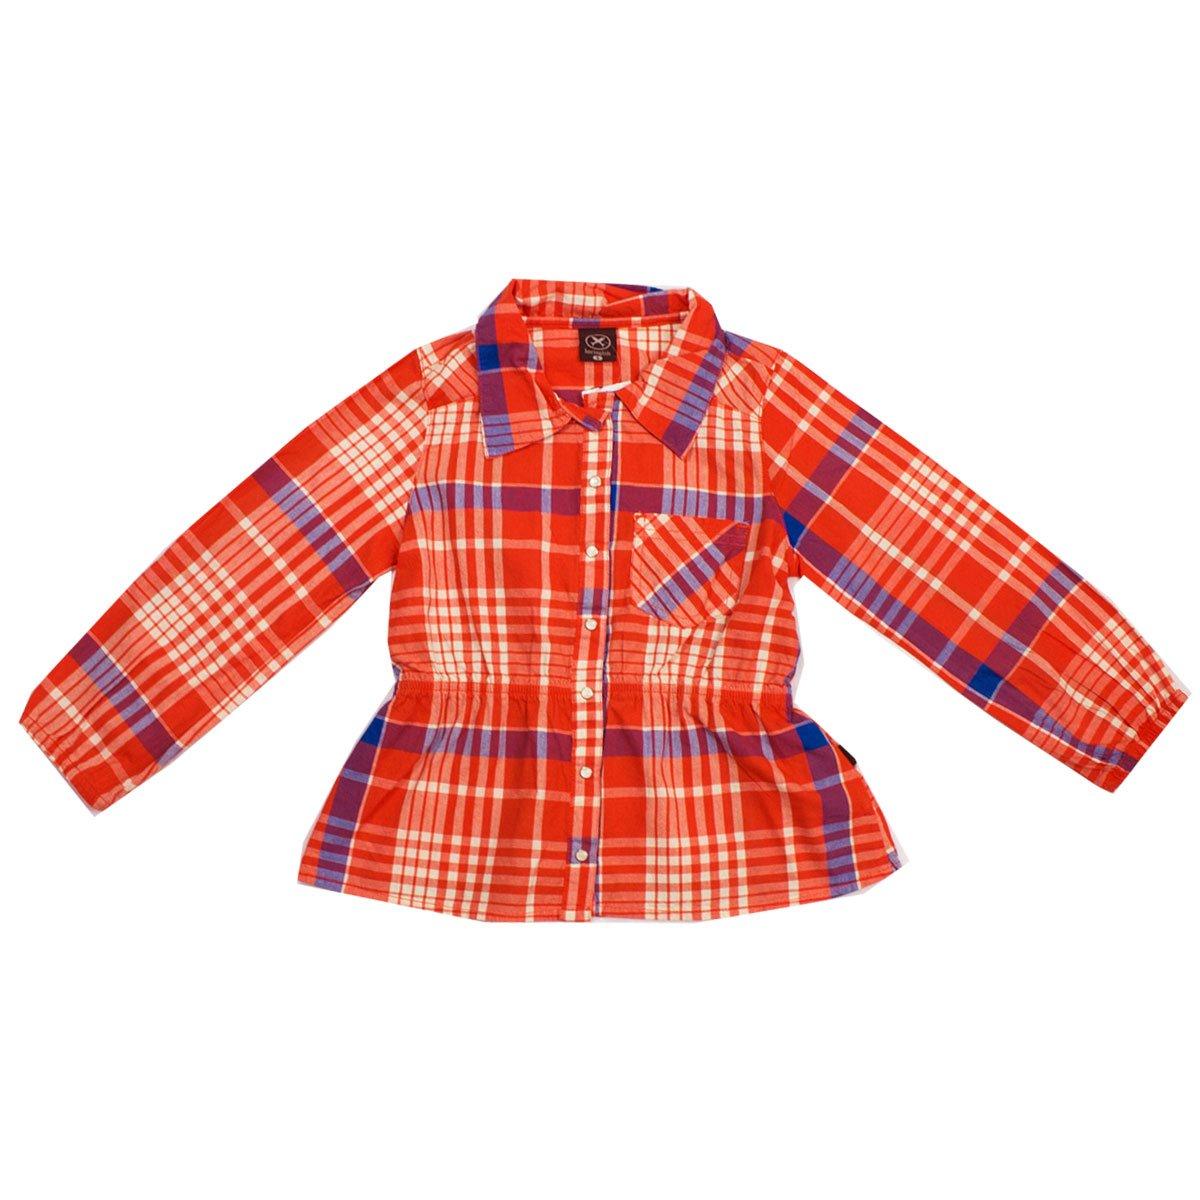 fe712a0b4e Bizz Store - Camisa Xadrez Infantil Hering Kids Laranja